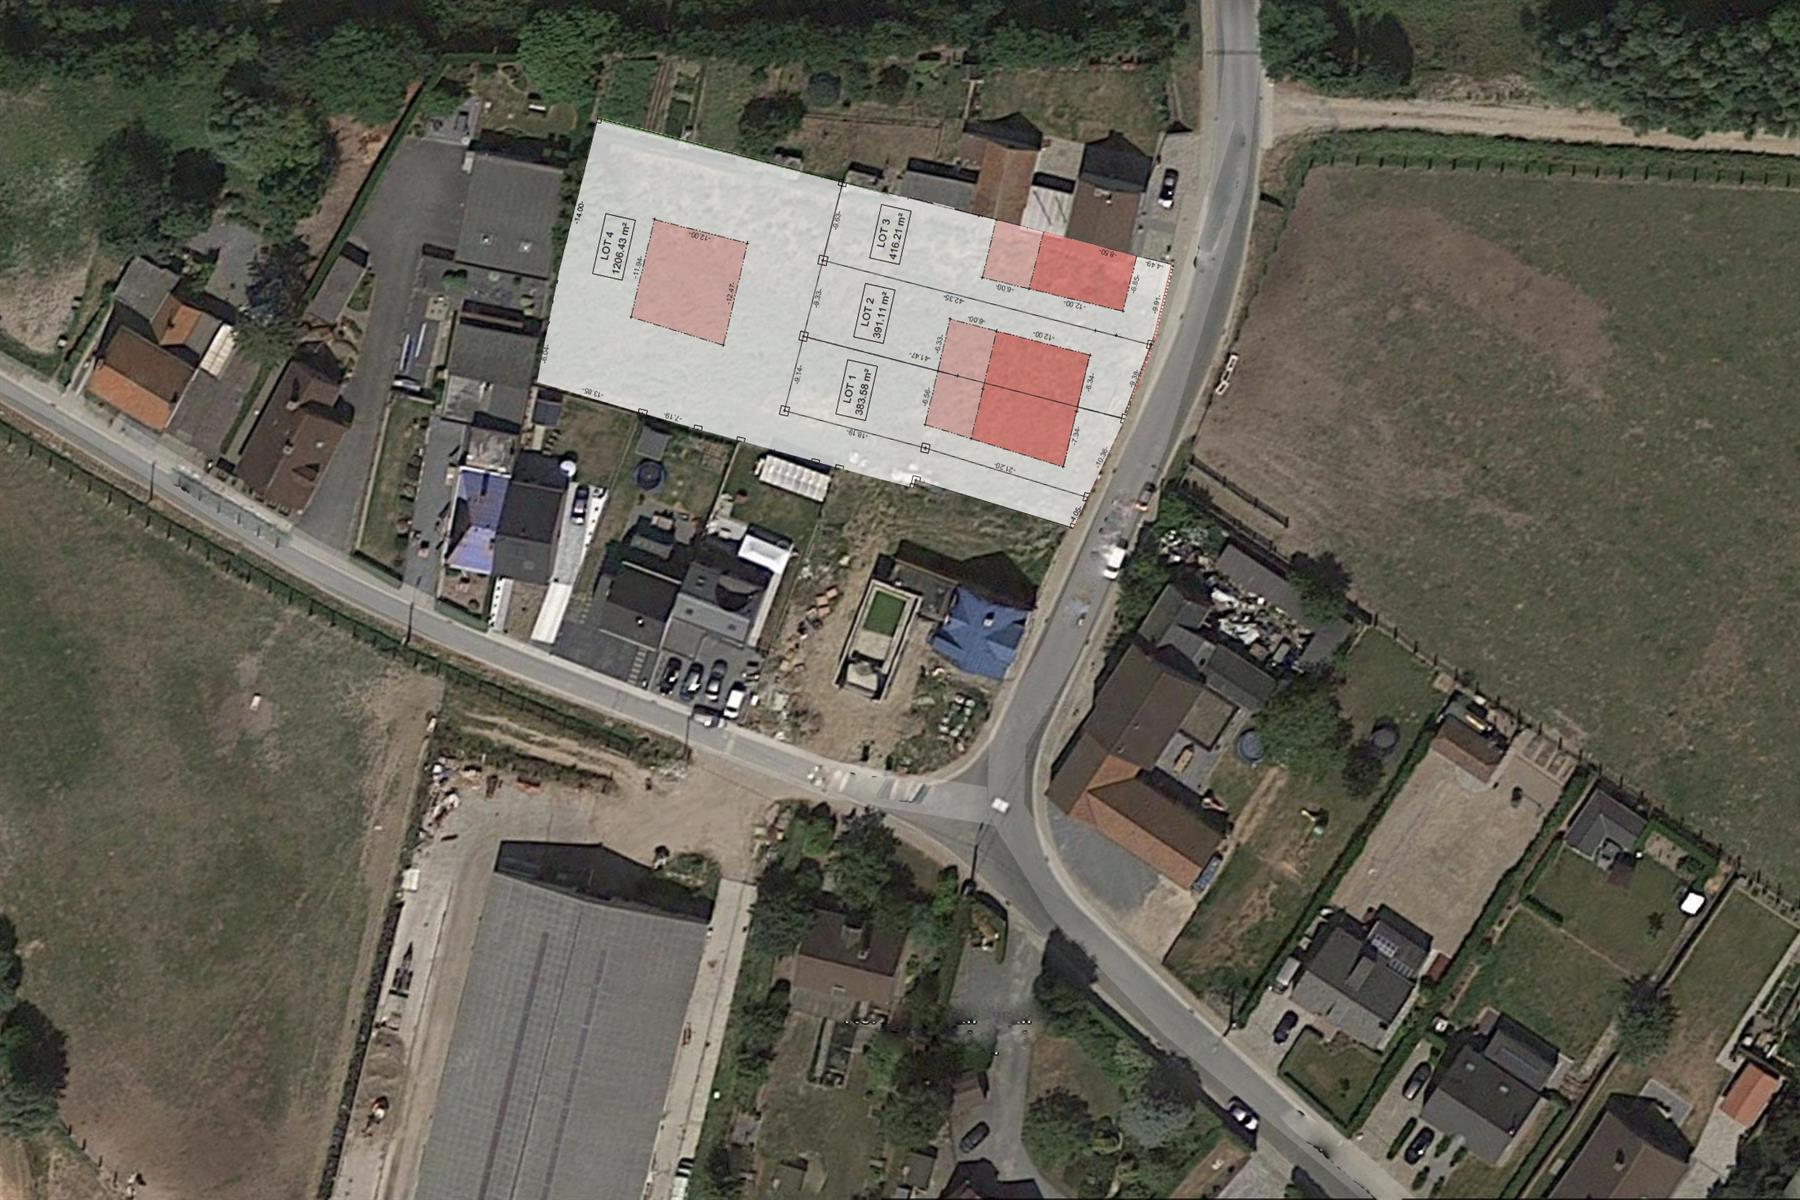 Rustig gelegen bouwgrond voor HOB te Oordegem 383m2